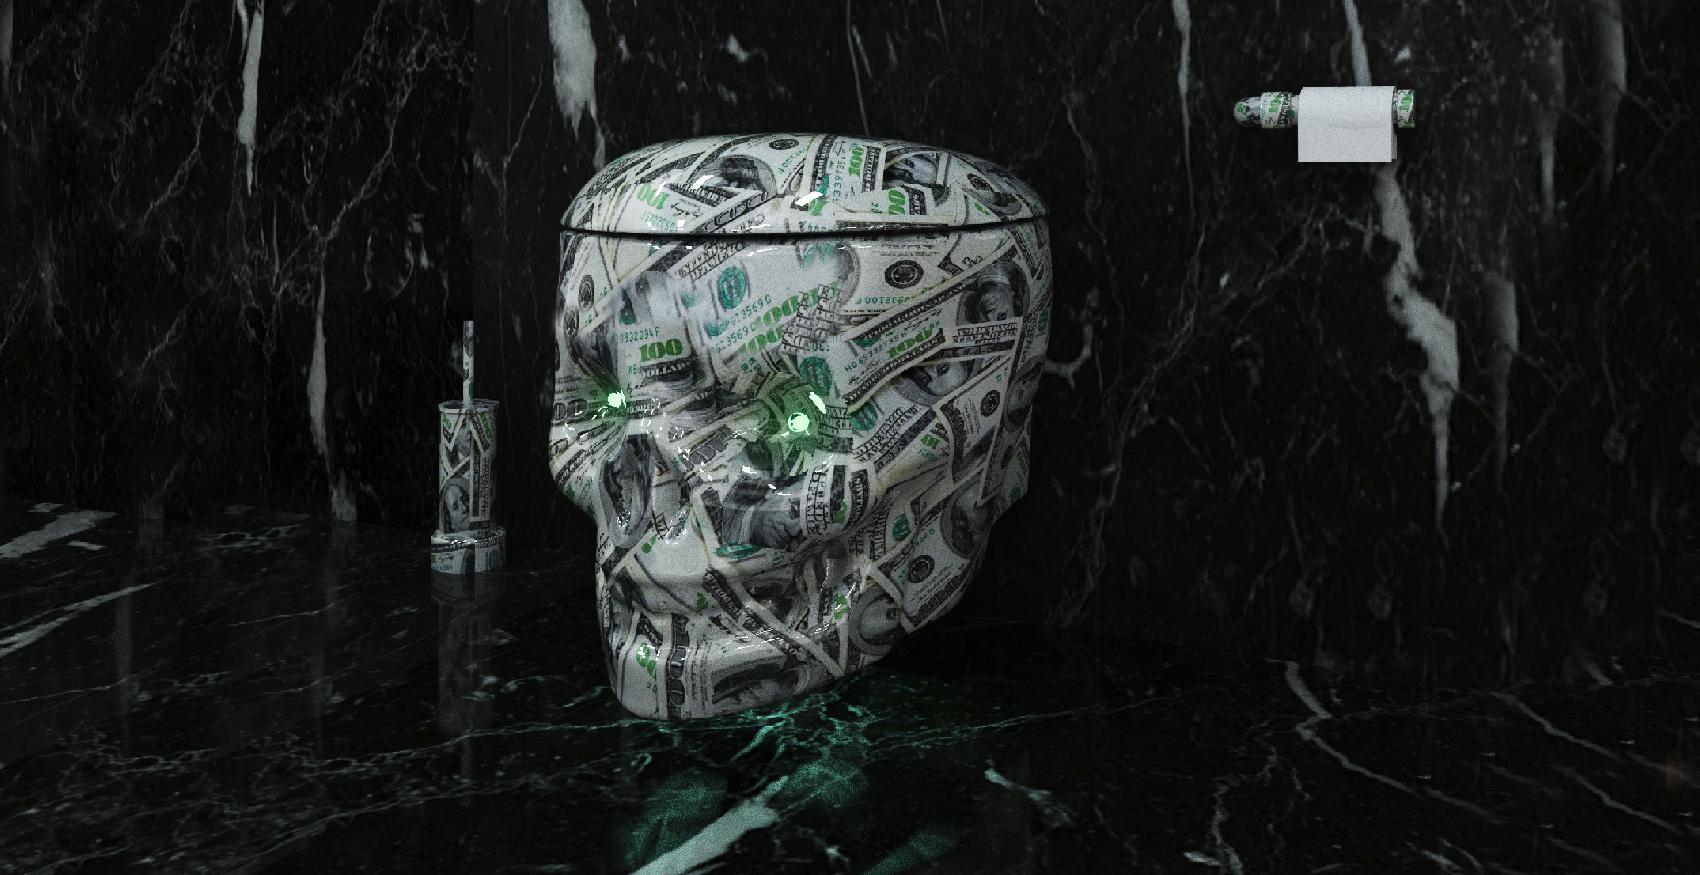 water throne dollar wc tete de mort toilet skull